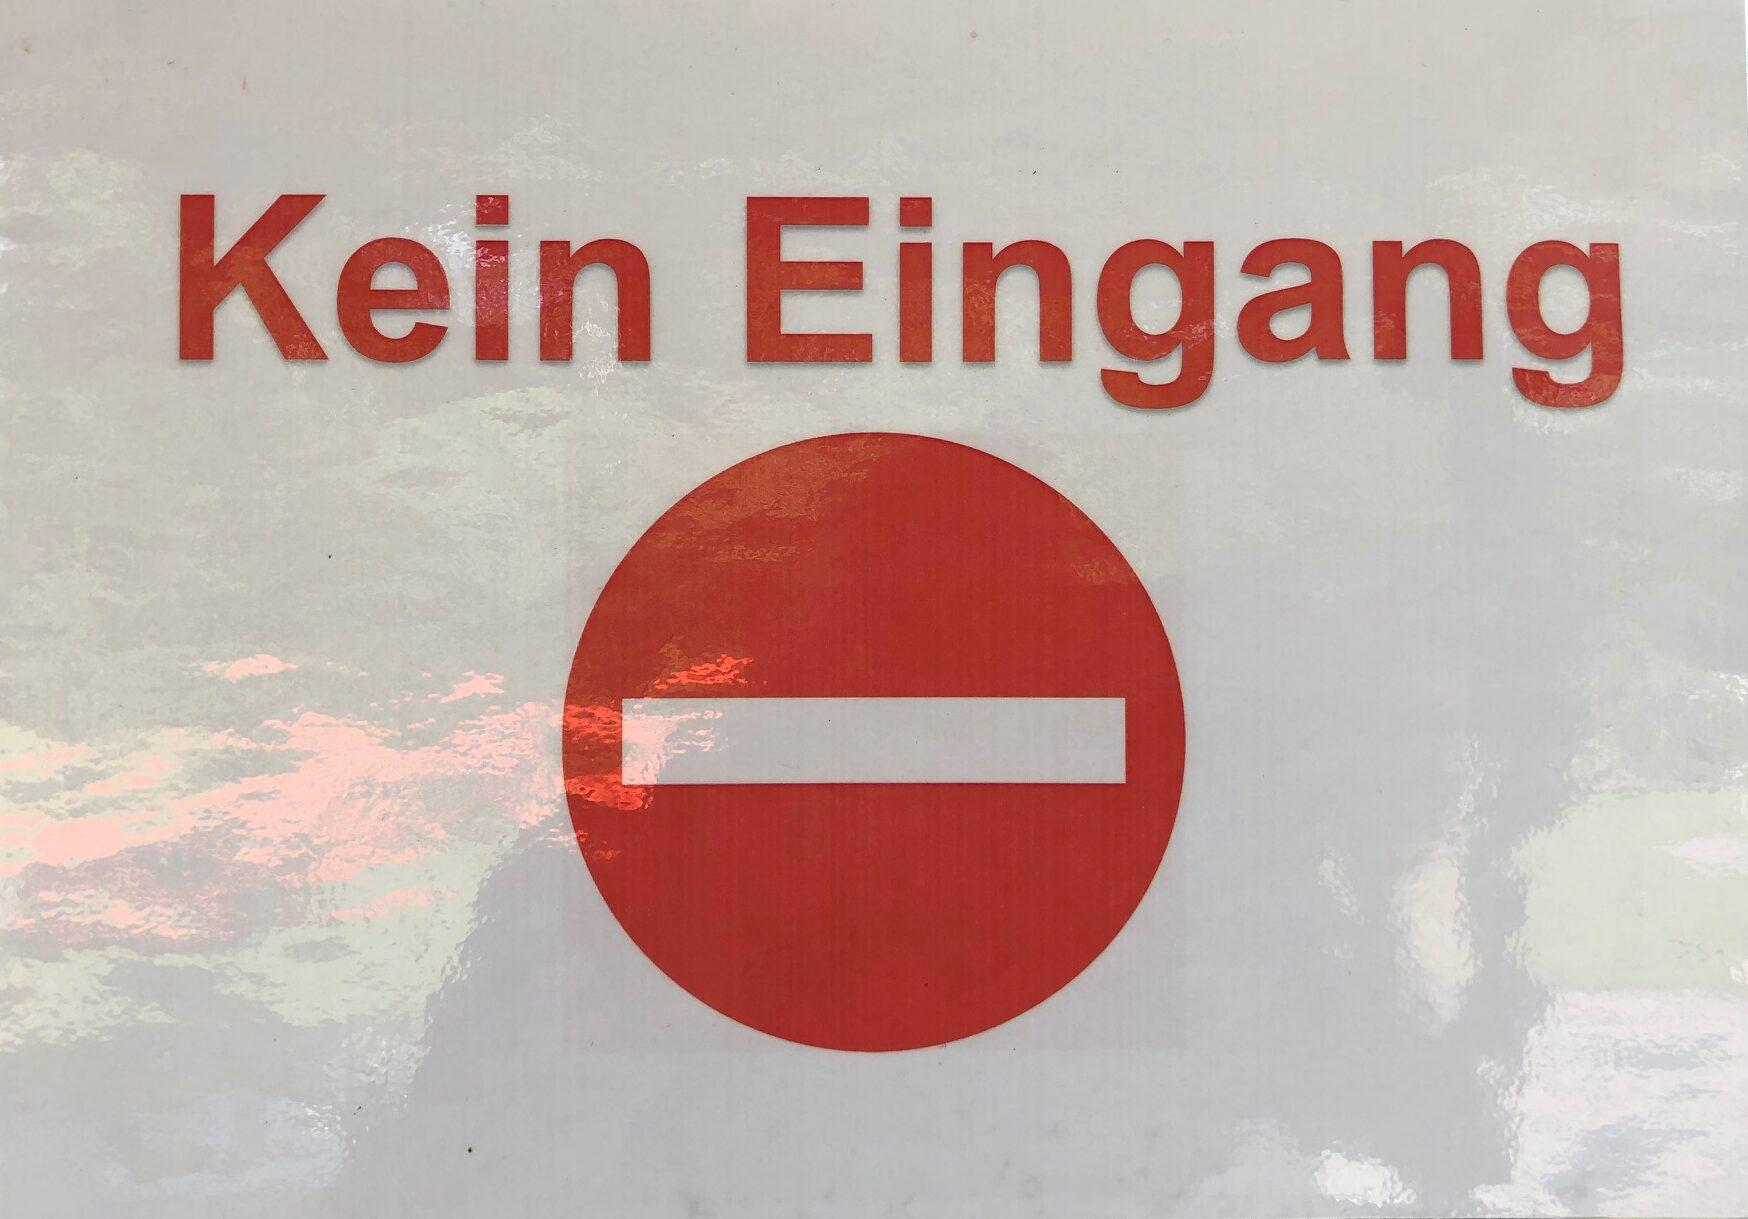 TCRH Mosbach Pandemie-Maßnahmen: Verkehrsführung und Besucherleitsystem